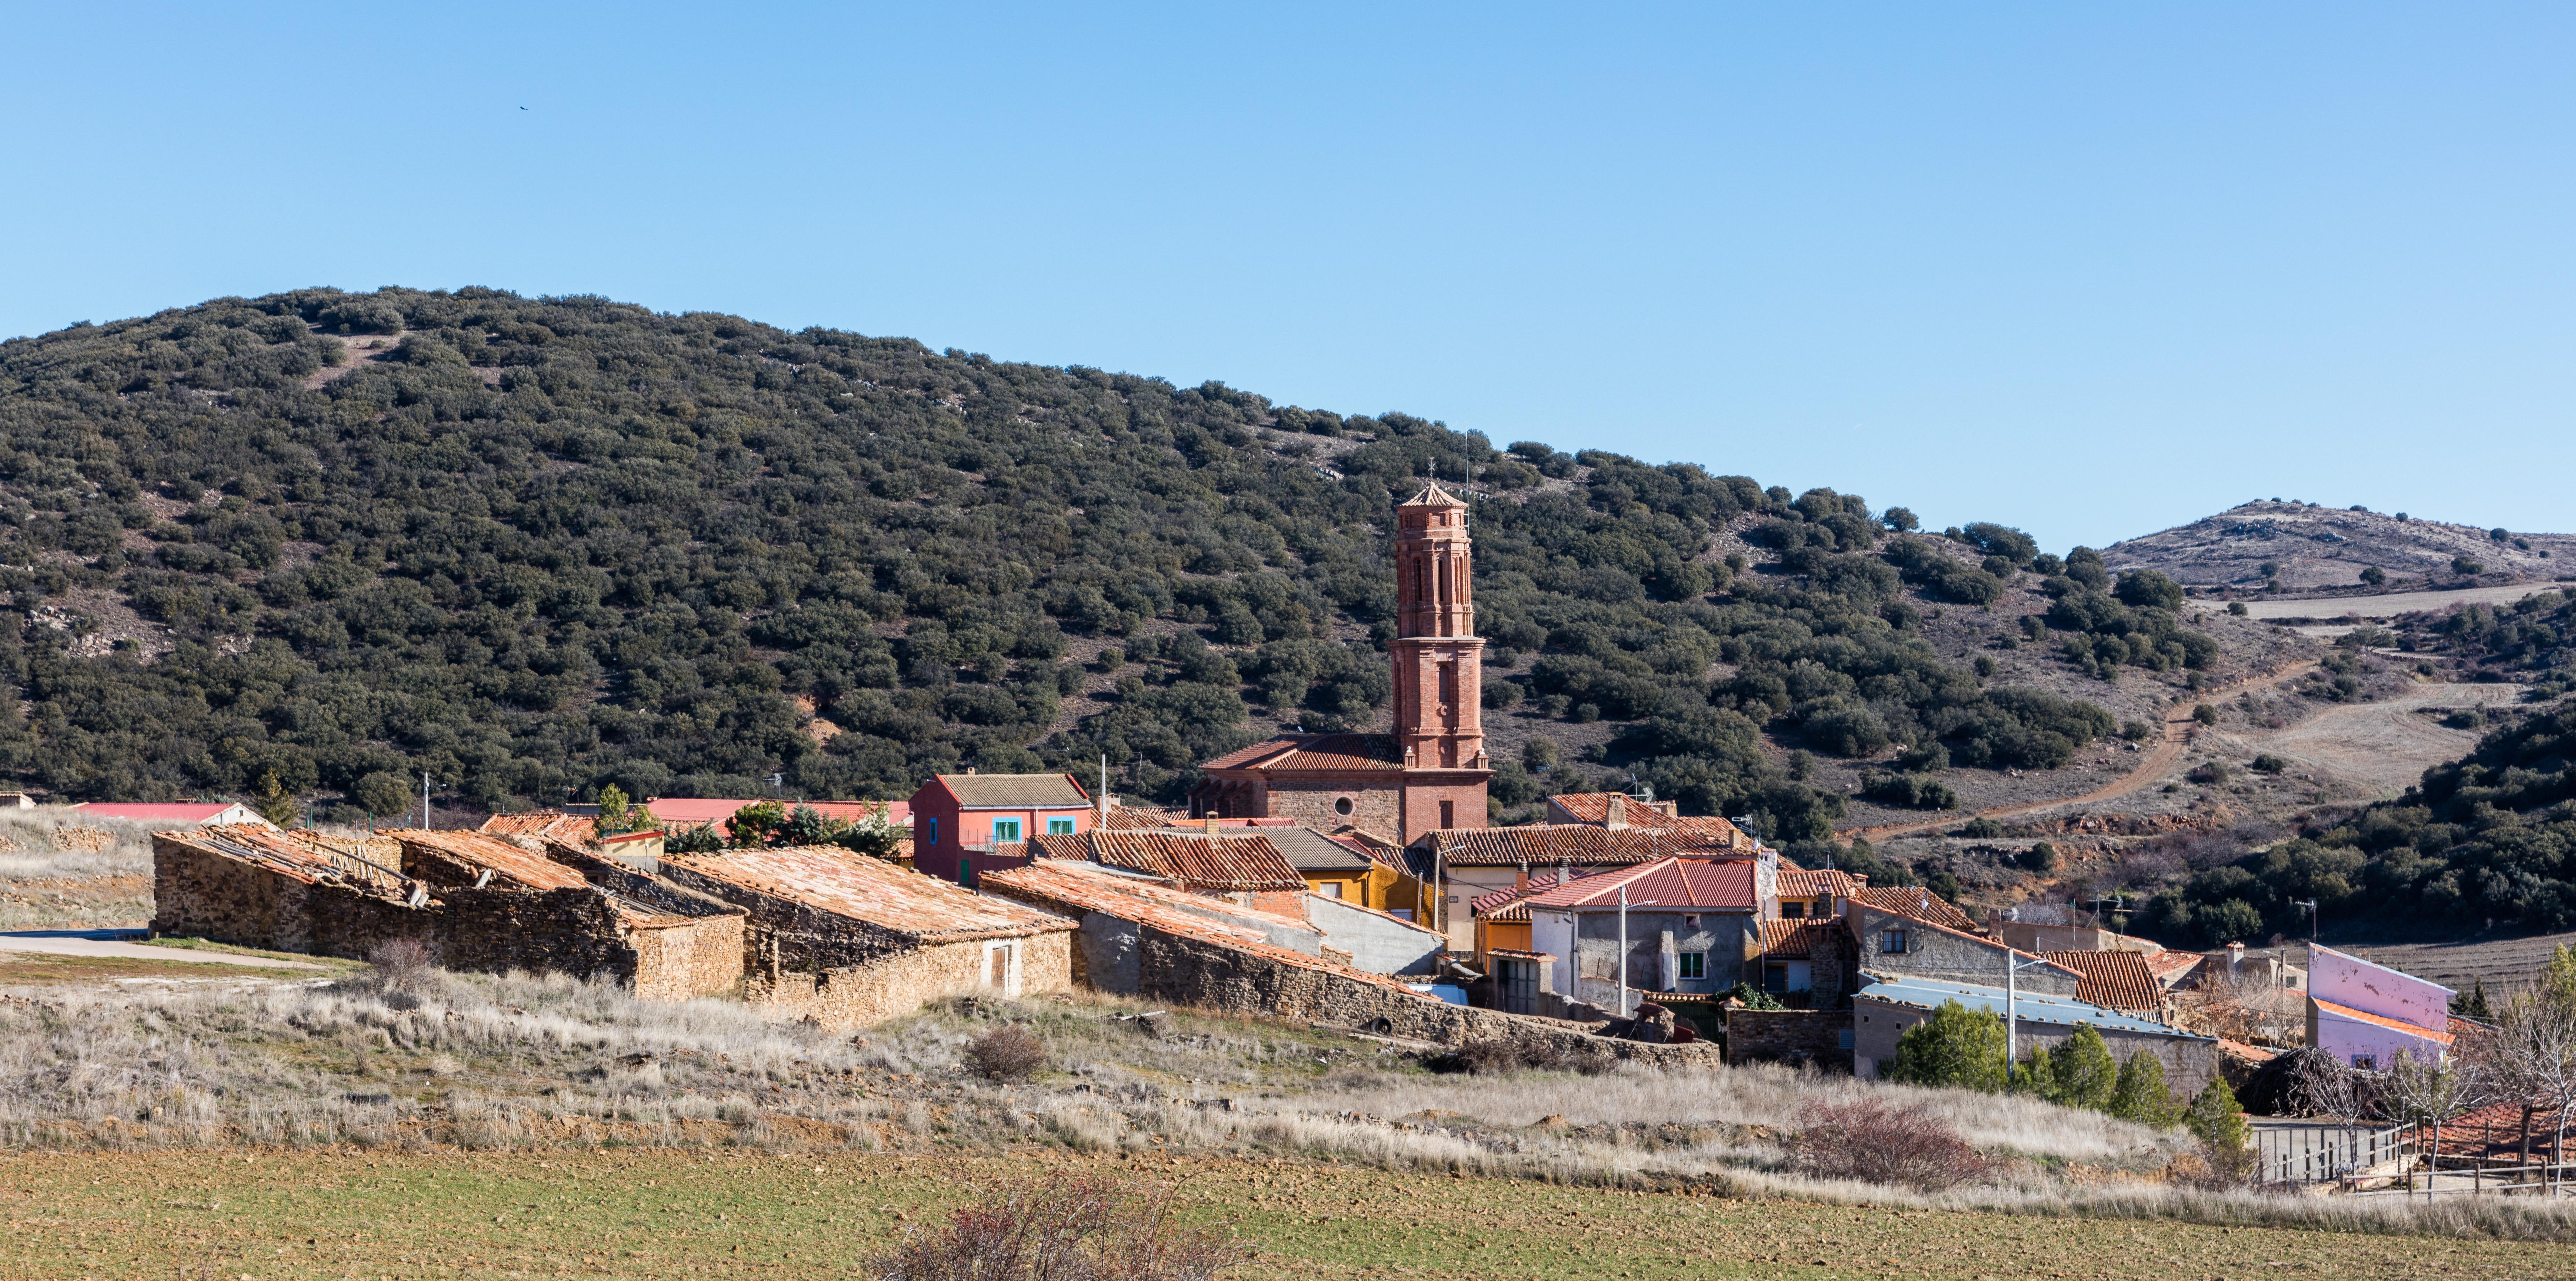 Санта-Крус-де-Ногерас